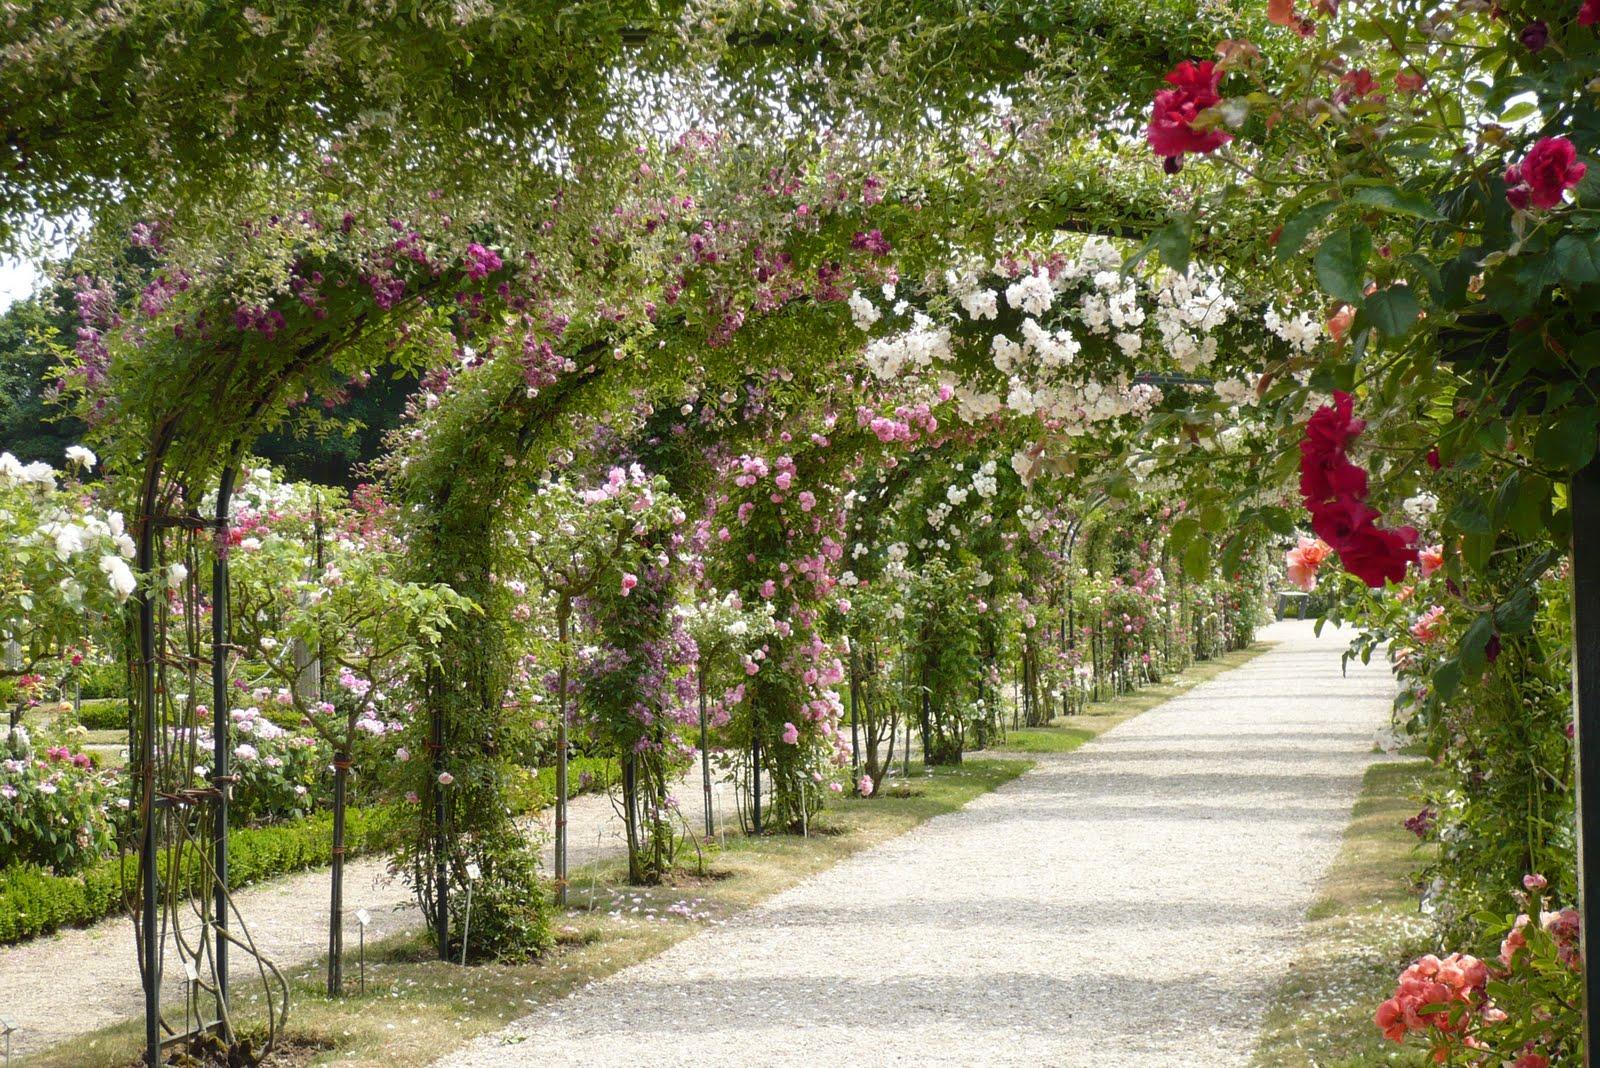 Le jardin de pacalou un jardin de roses for Jardins a visiter